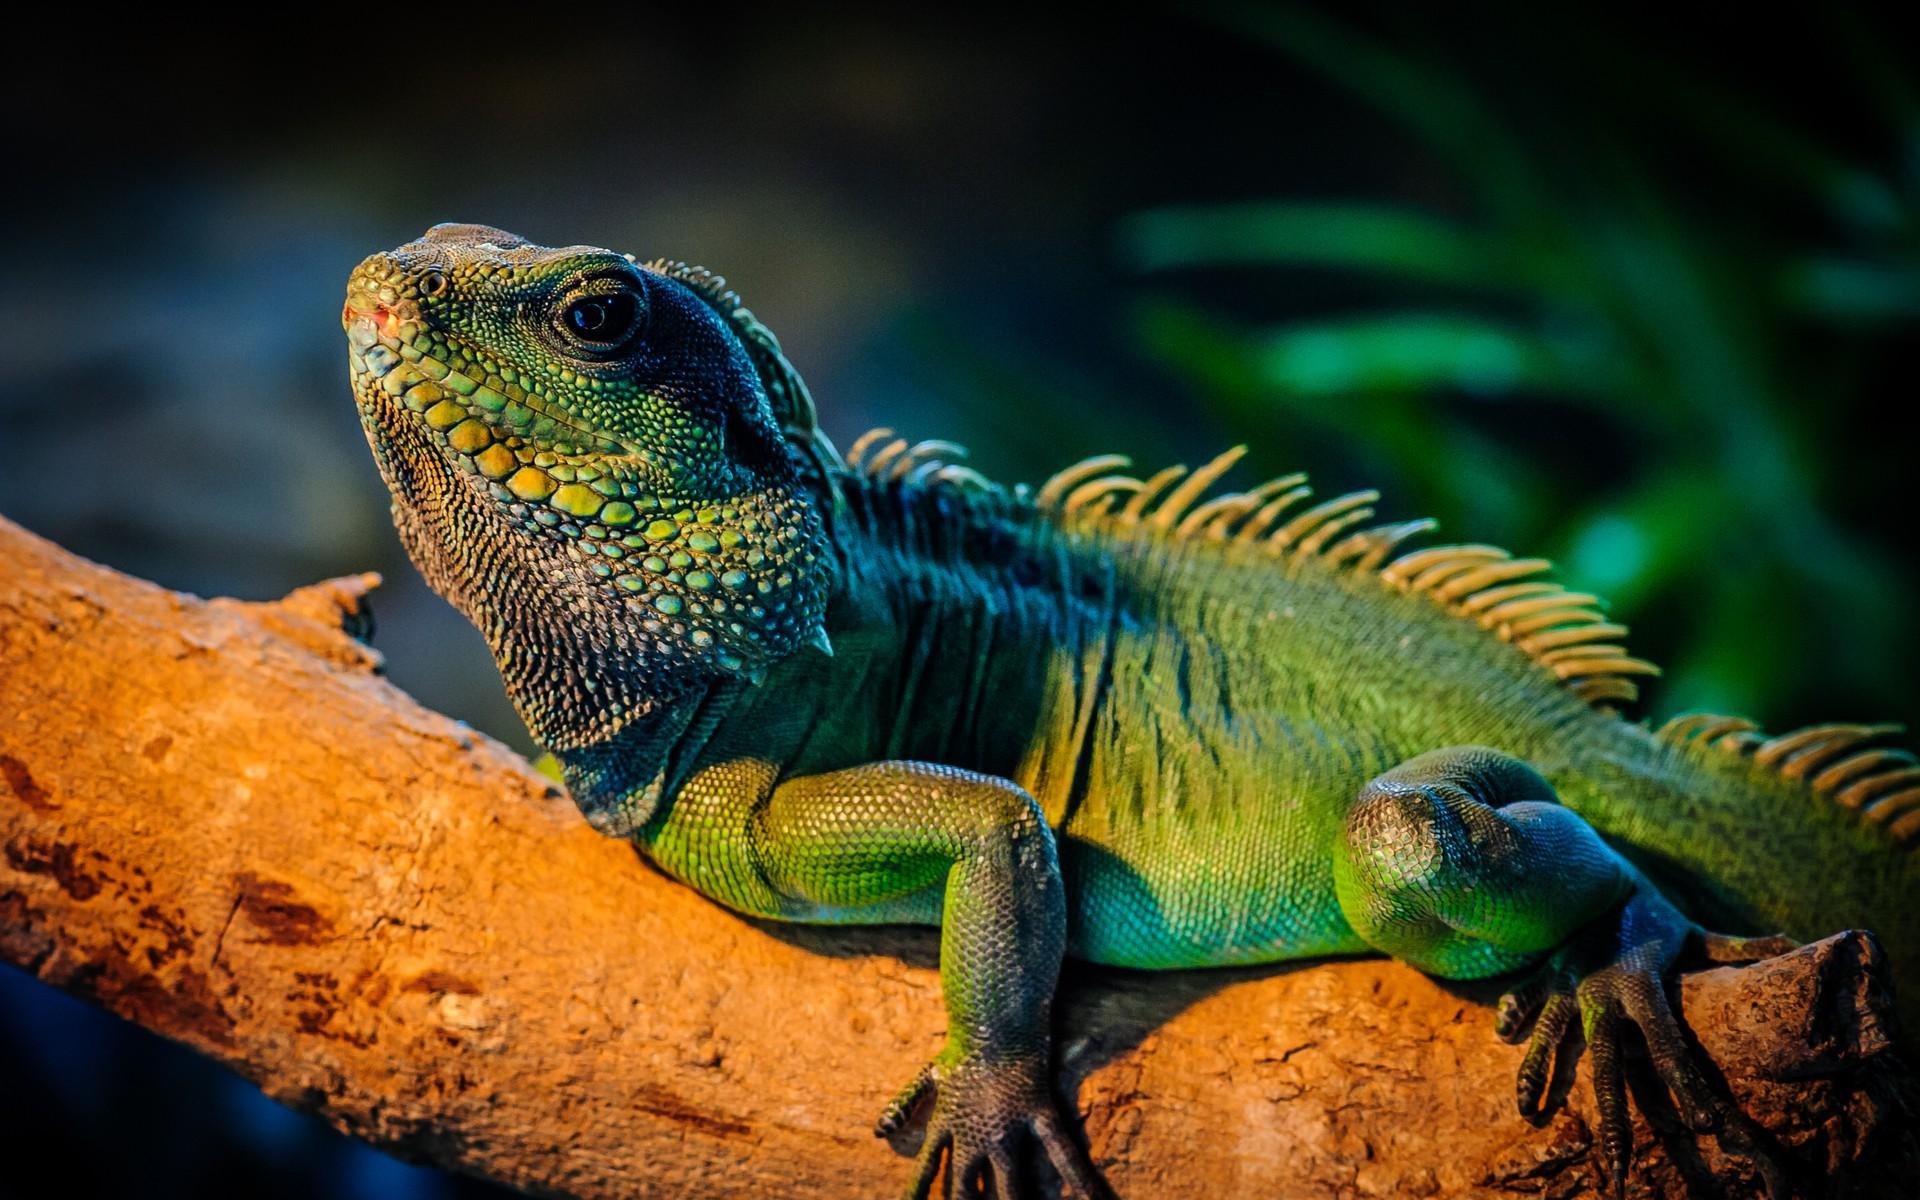 H D Reptiles Mundo reptil 55 imagen...